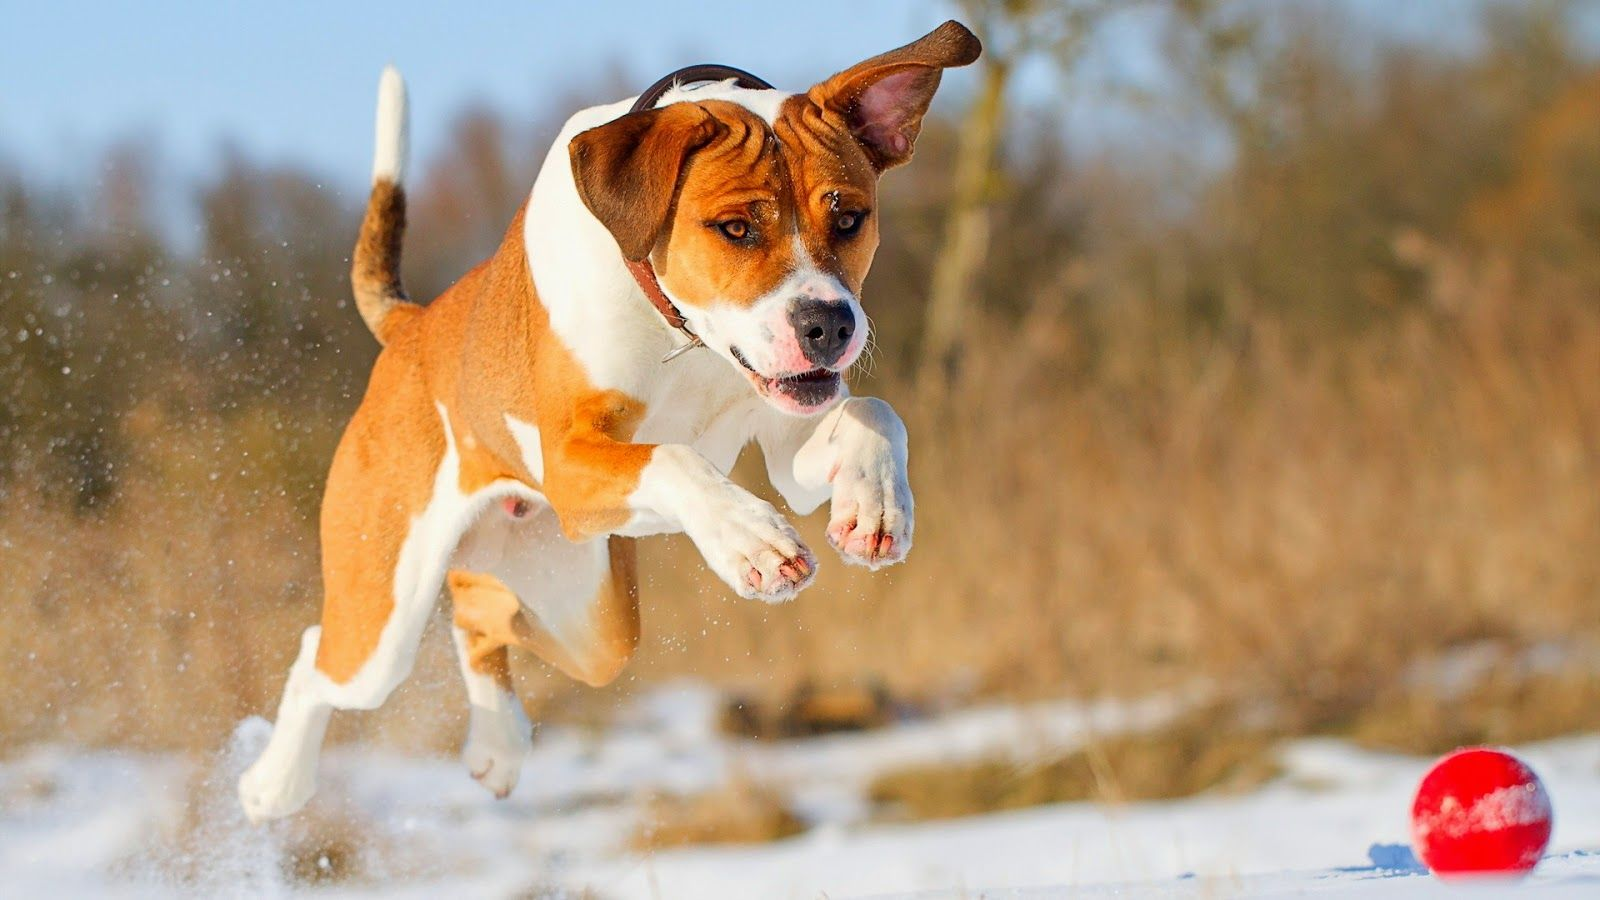 Cute Dog Wallpapers Wallpaper Обои с собаками, Милые